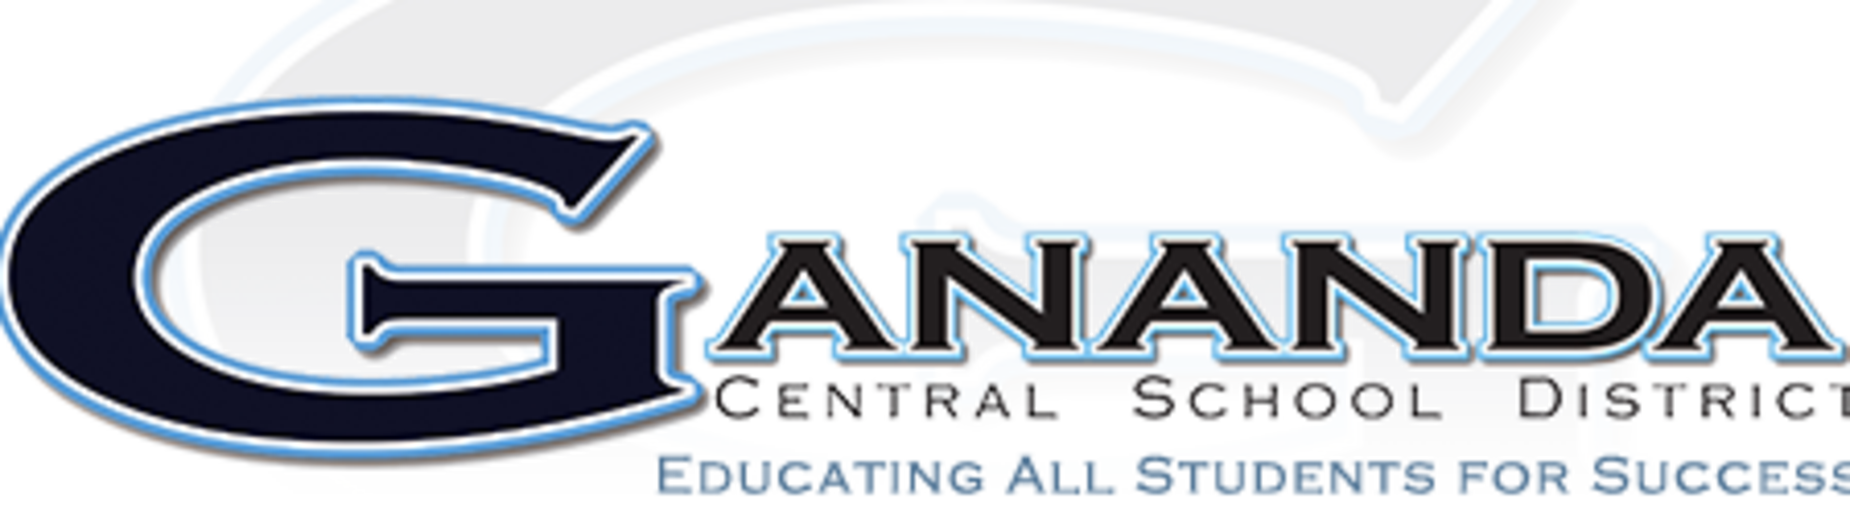 Gananda Central School District